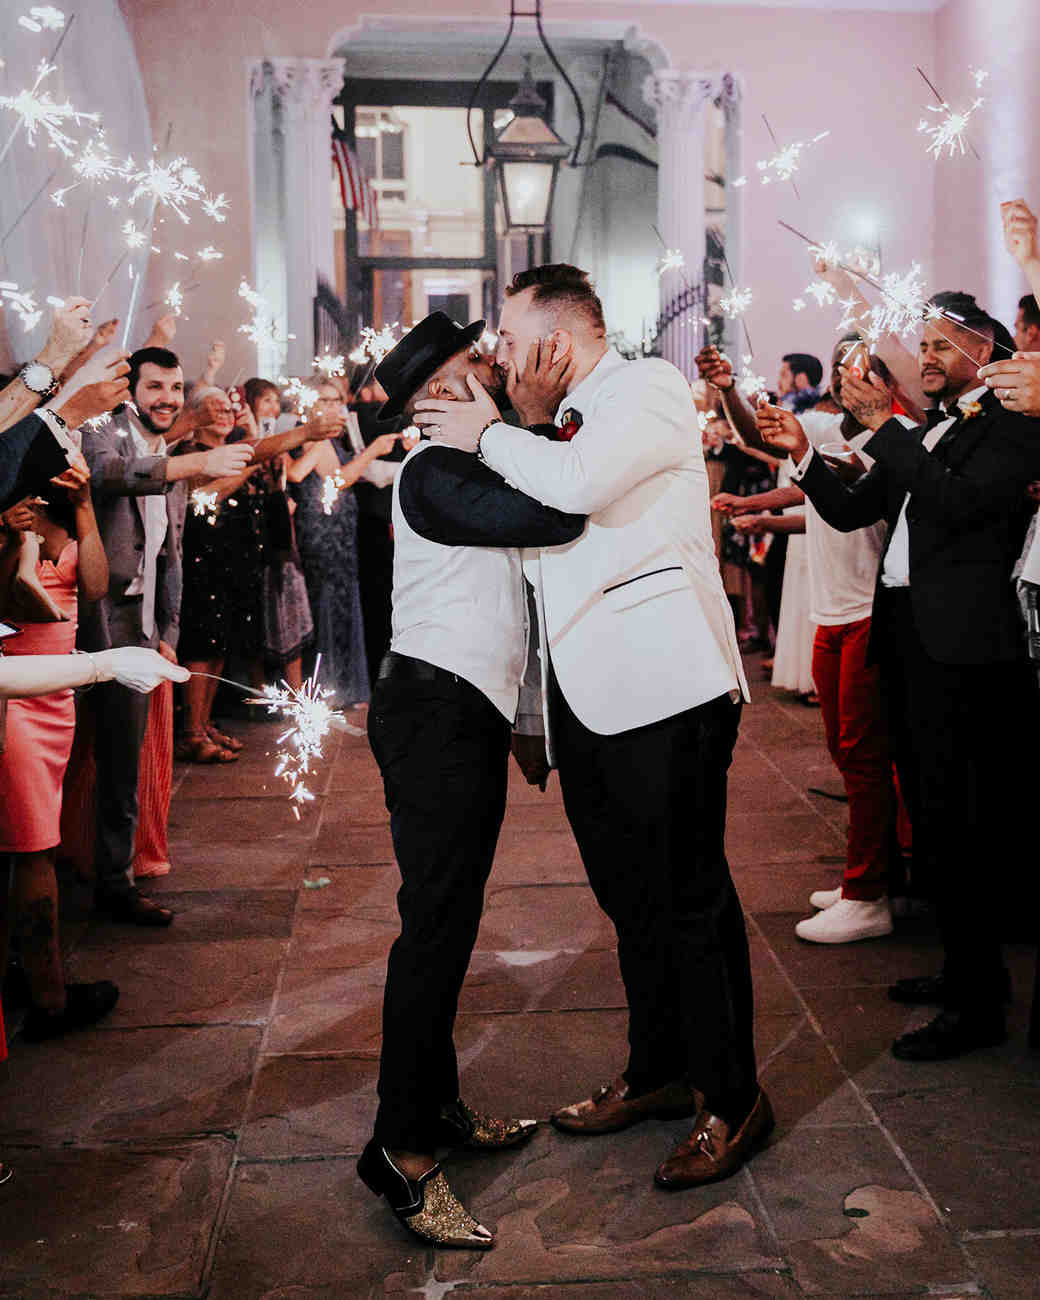 joe-tim-wedding-sparkler-sendoff-1634-1018_vert.jpg